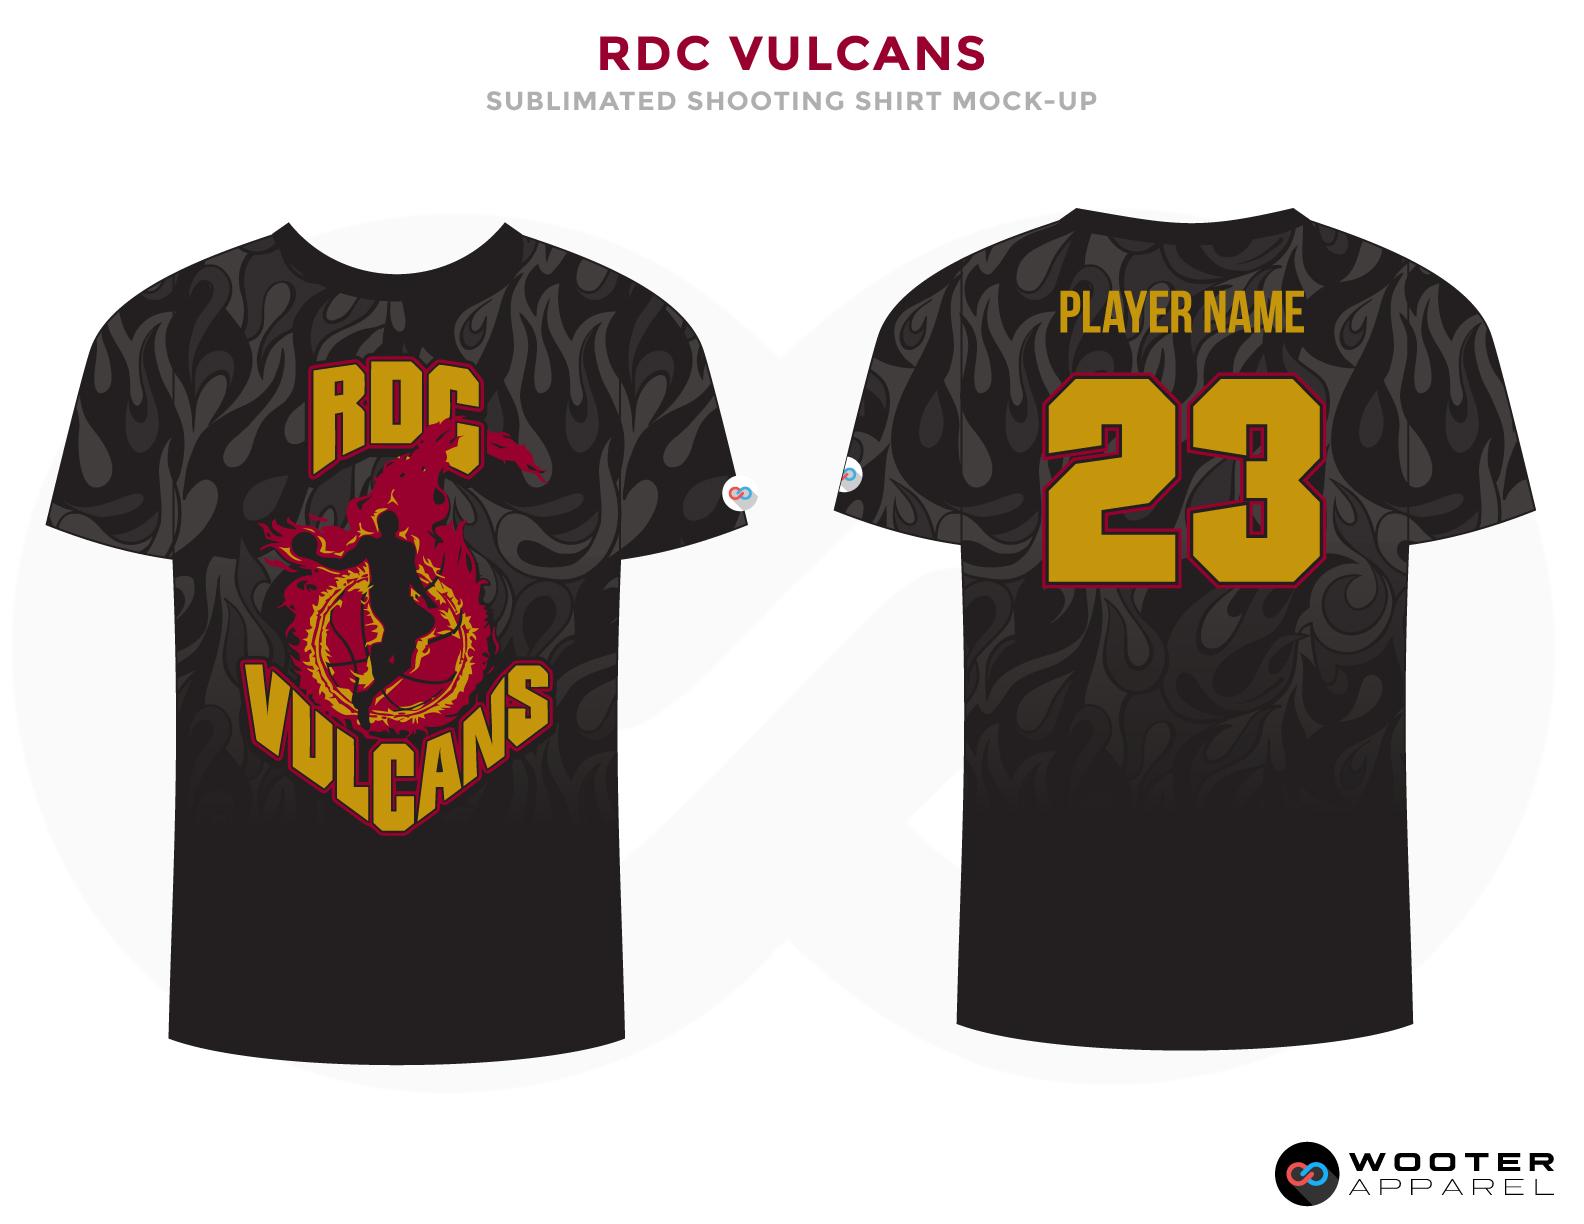 RDC VULCANS Black Red and Golden Basketball Uniforms, Jersey